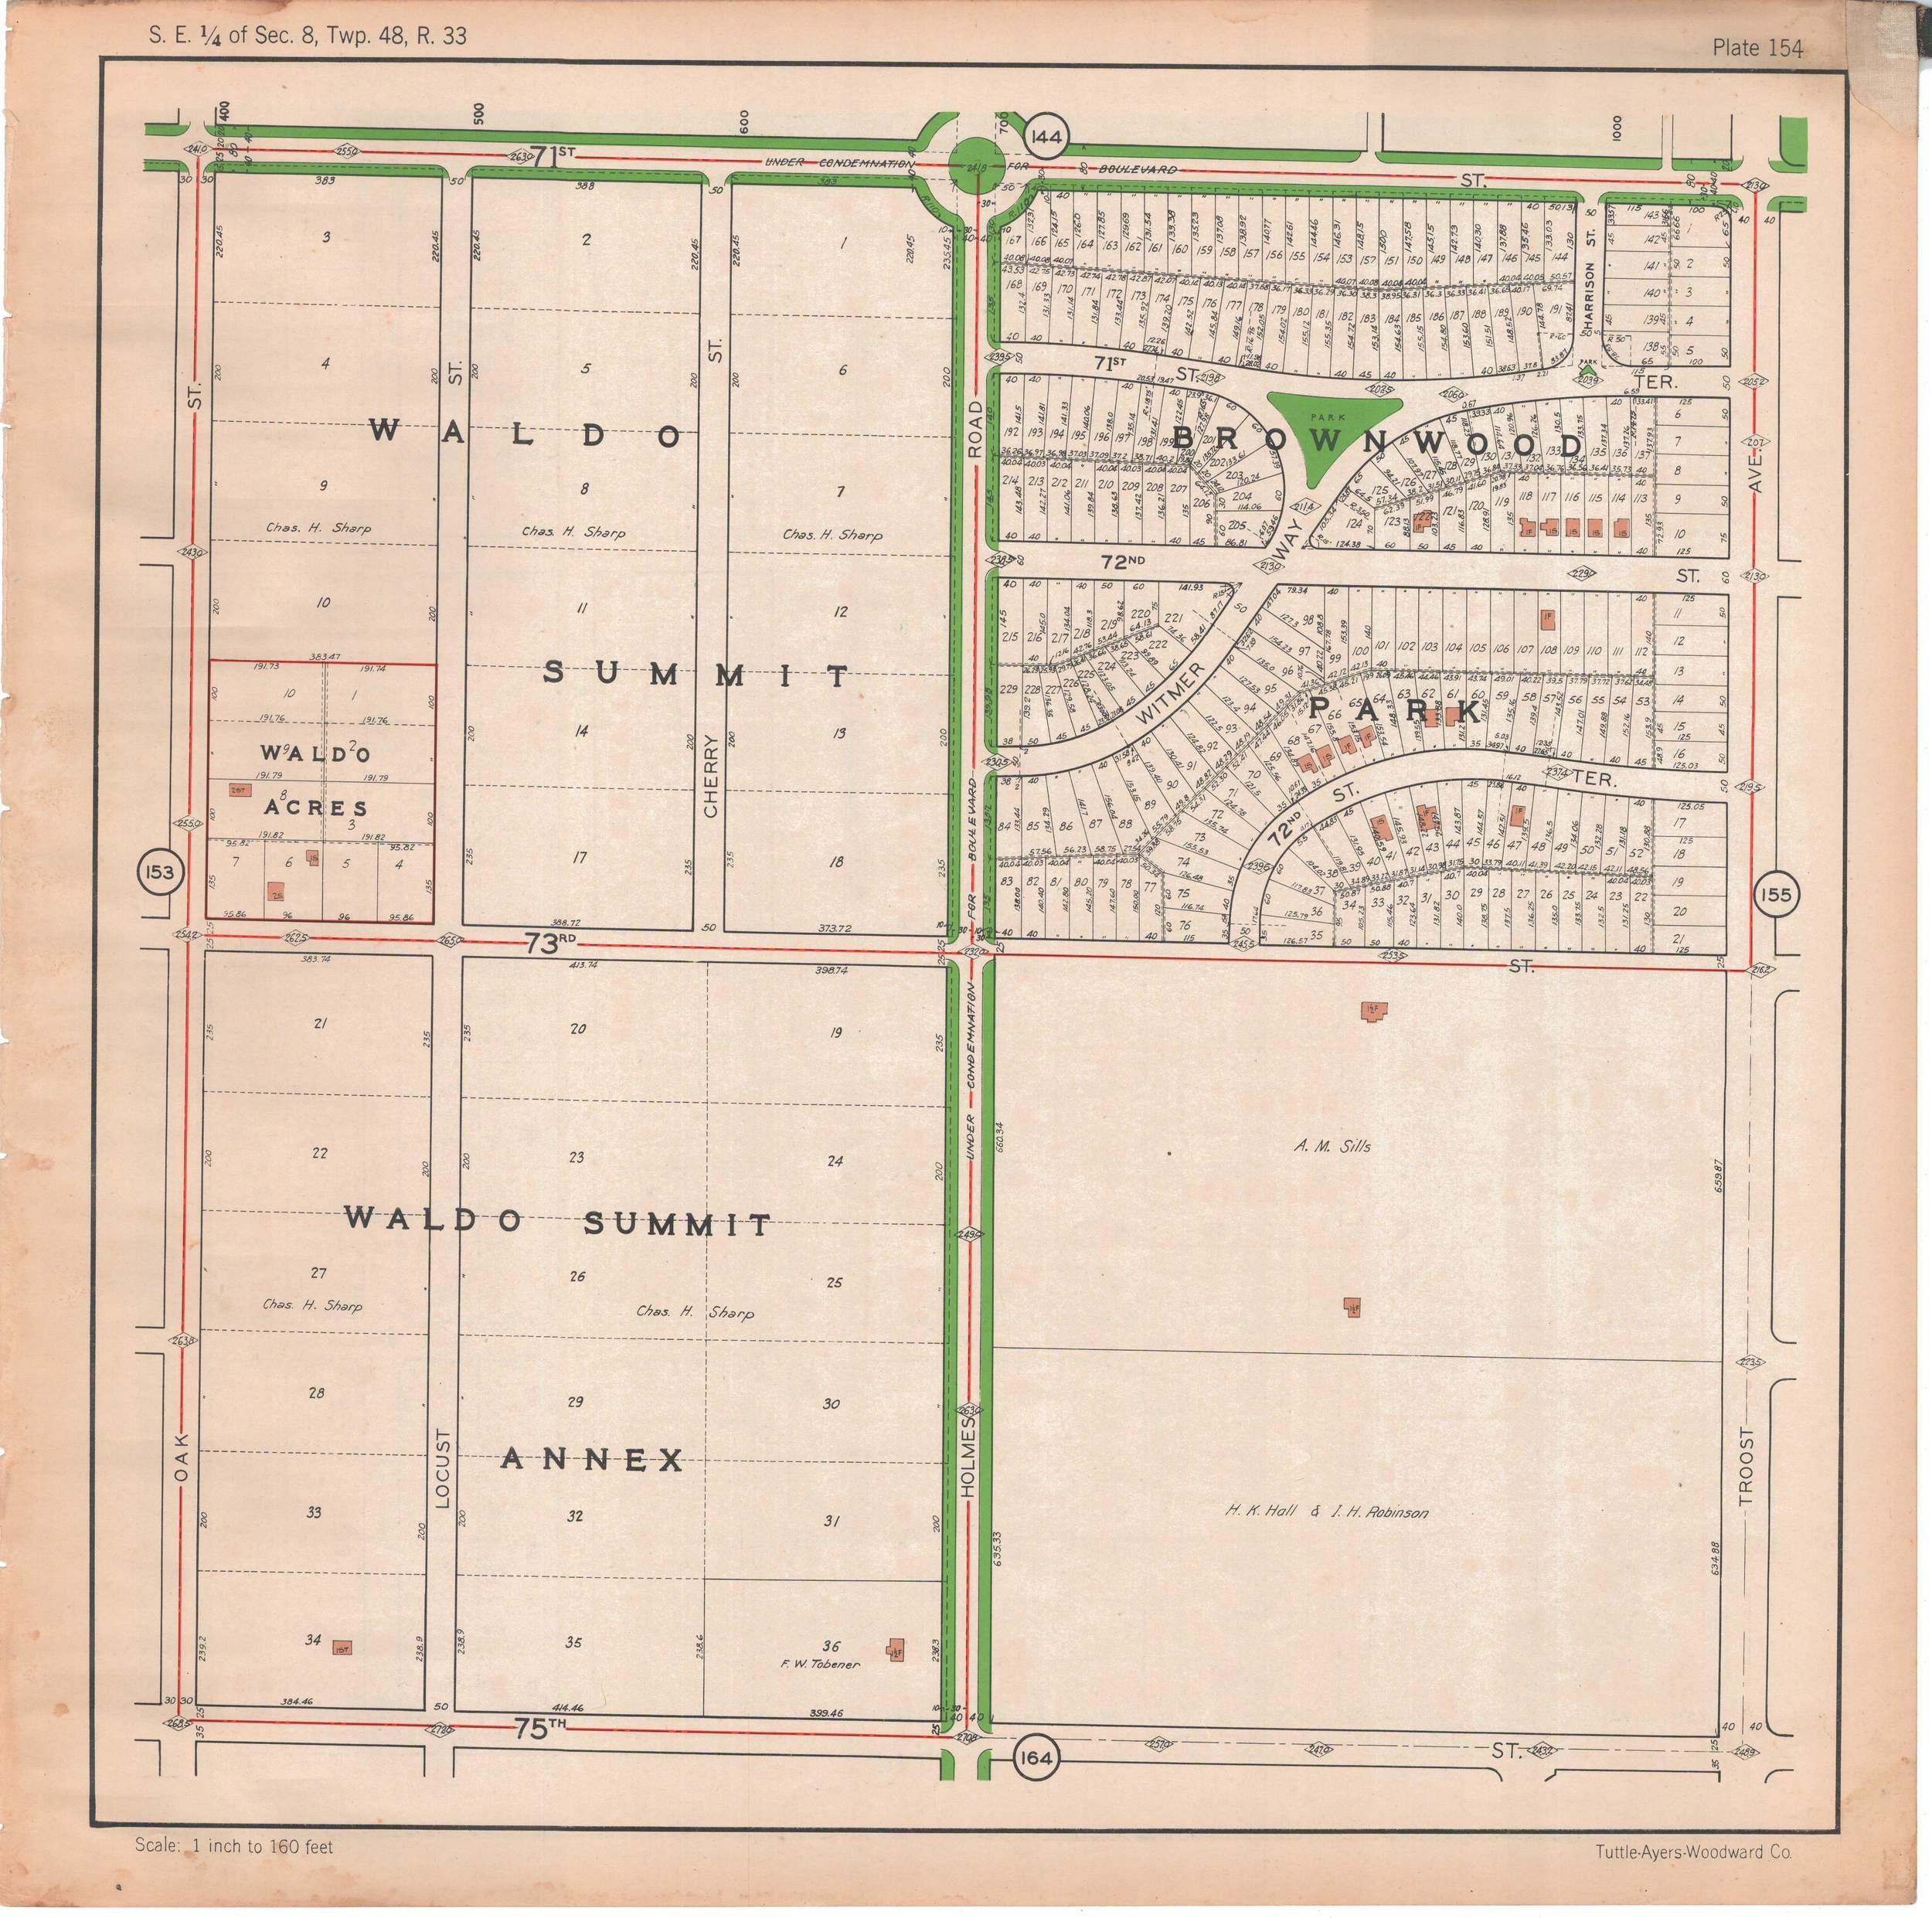 1925 TUTTLE_AYERS_Plate_154.JPG